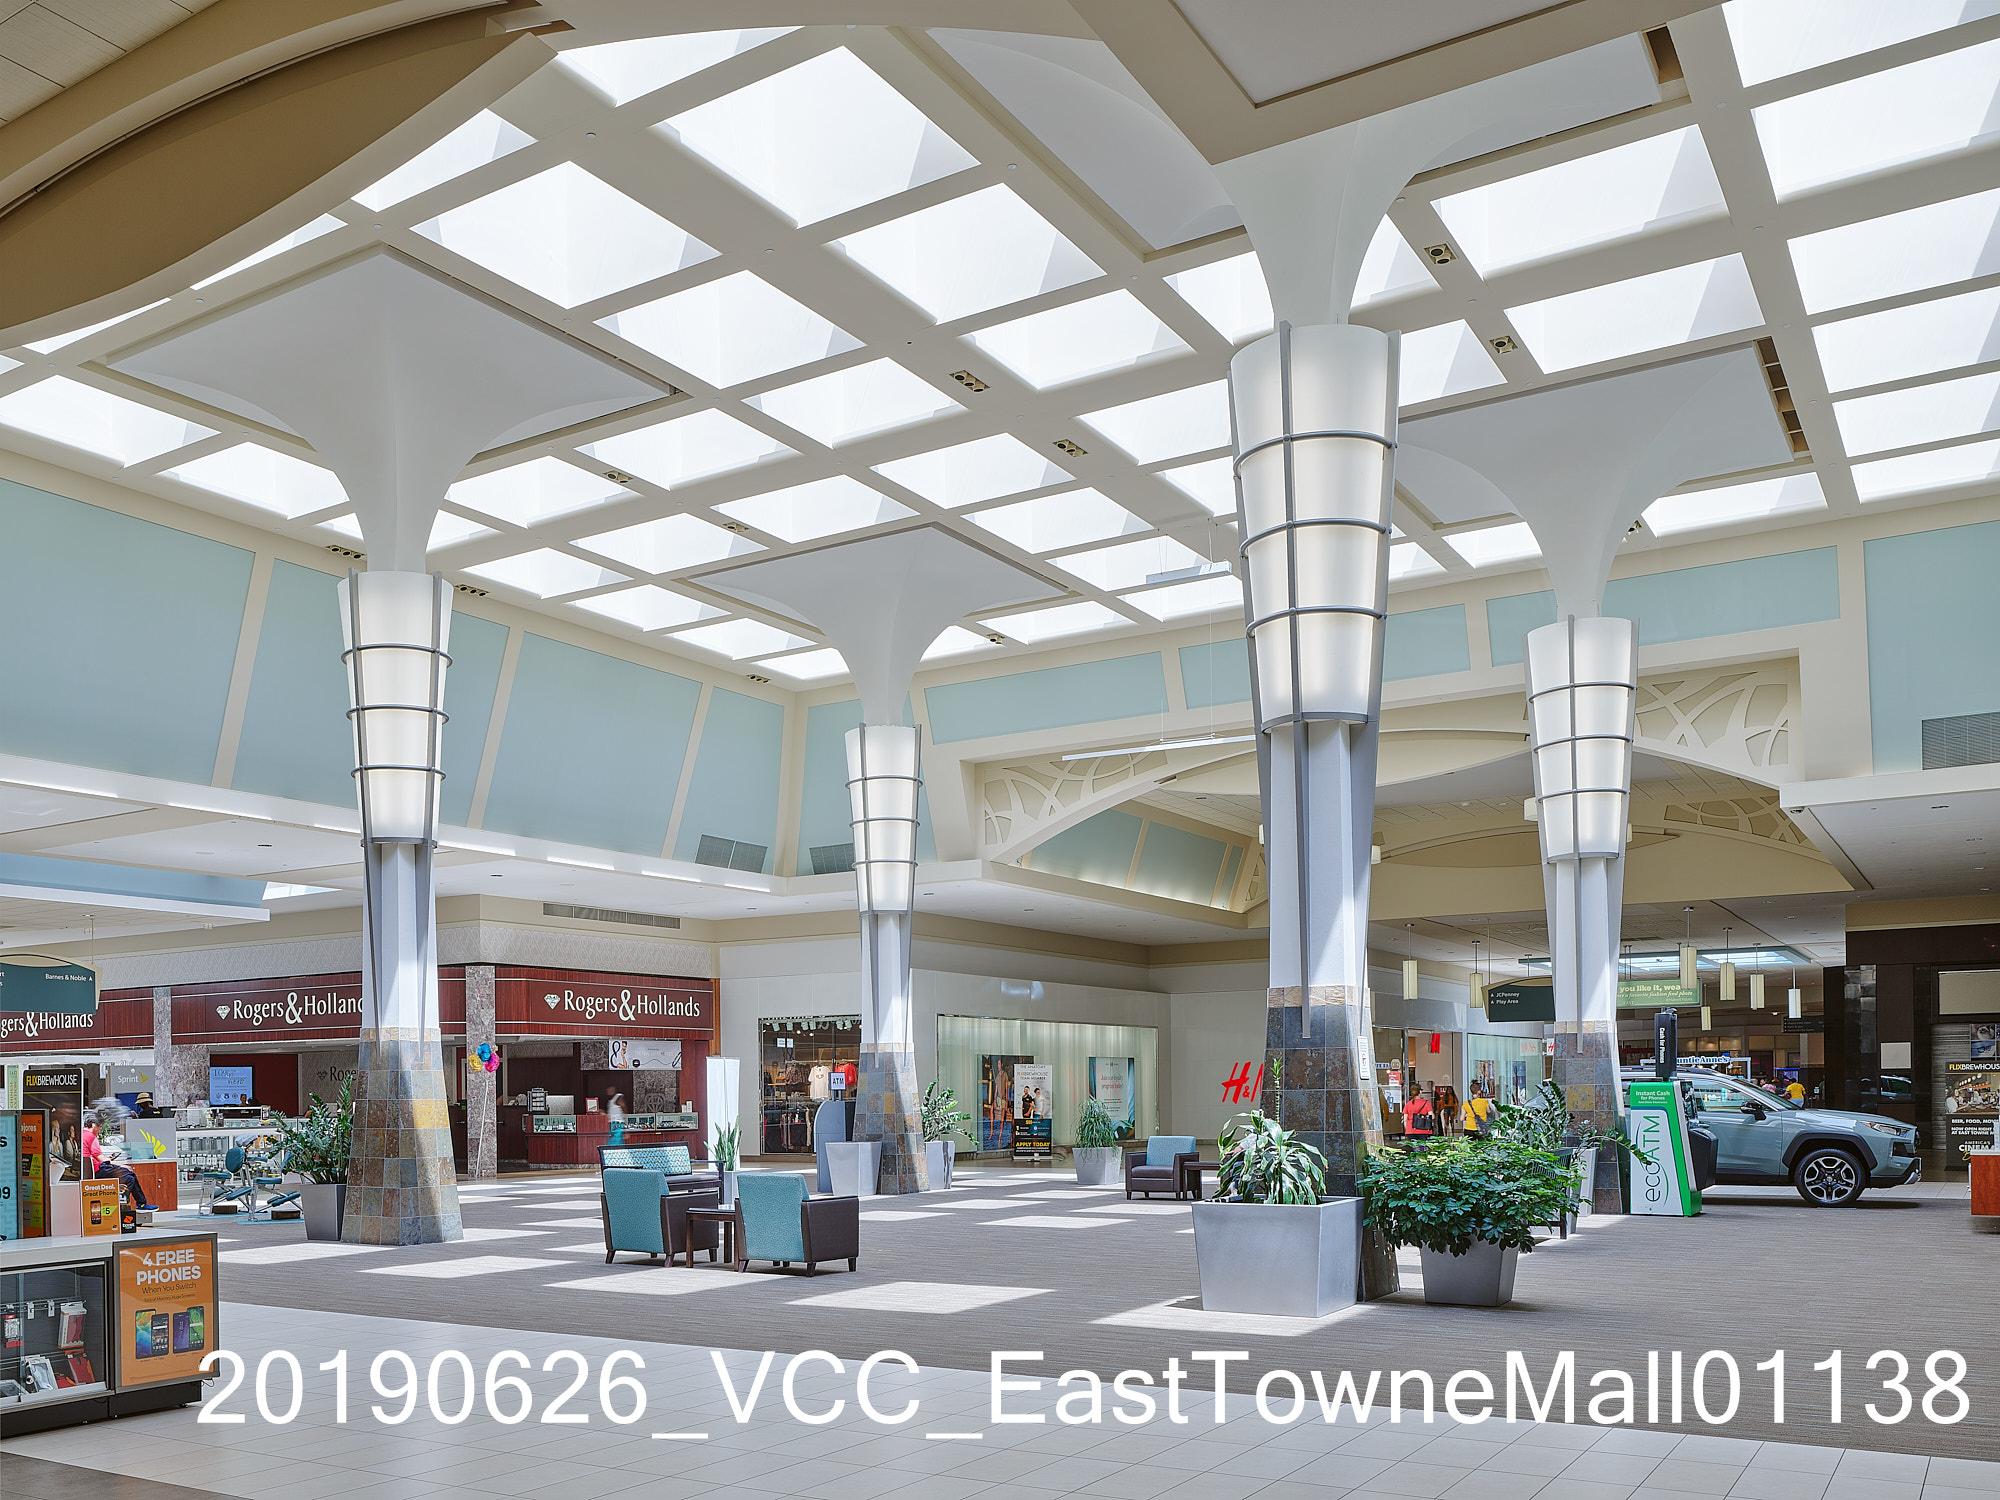 20190626_VCC_EastTowneMall01138.jpg